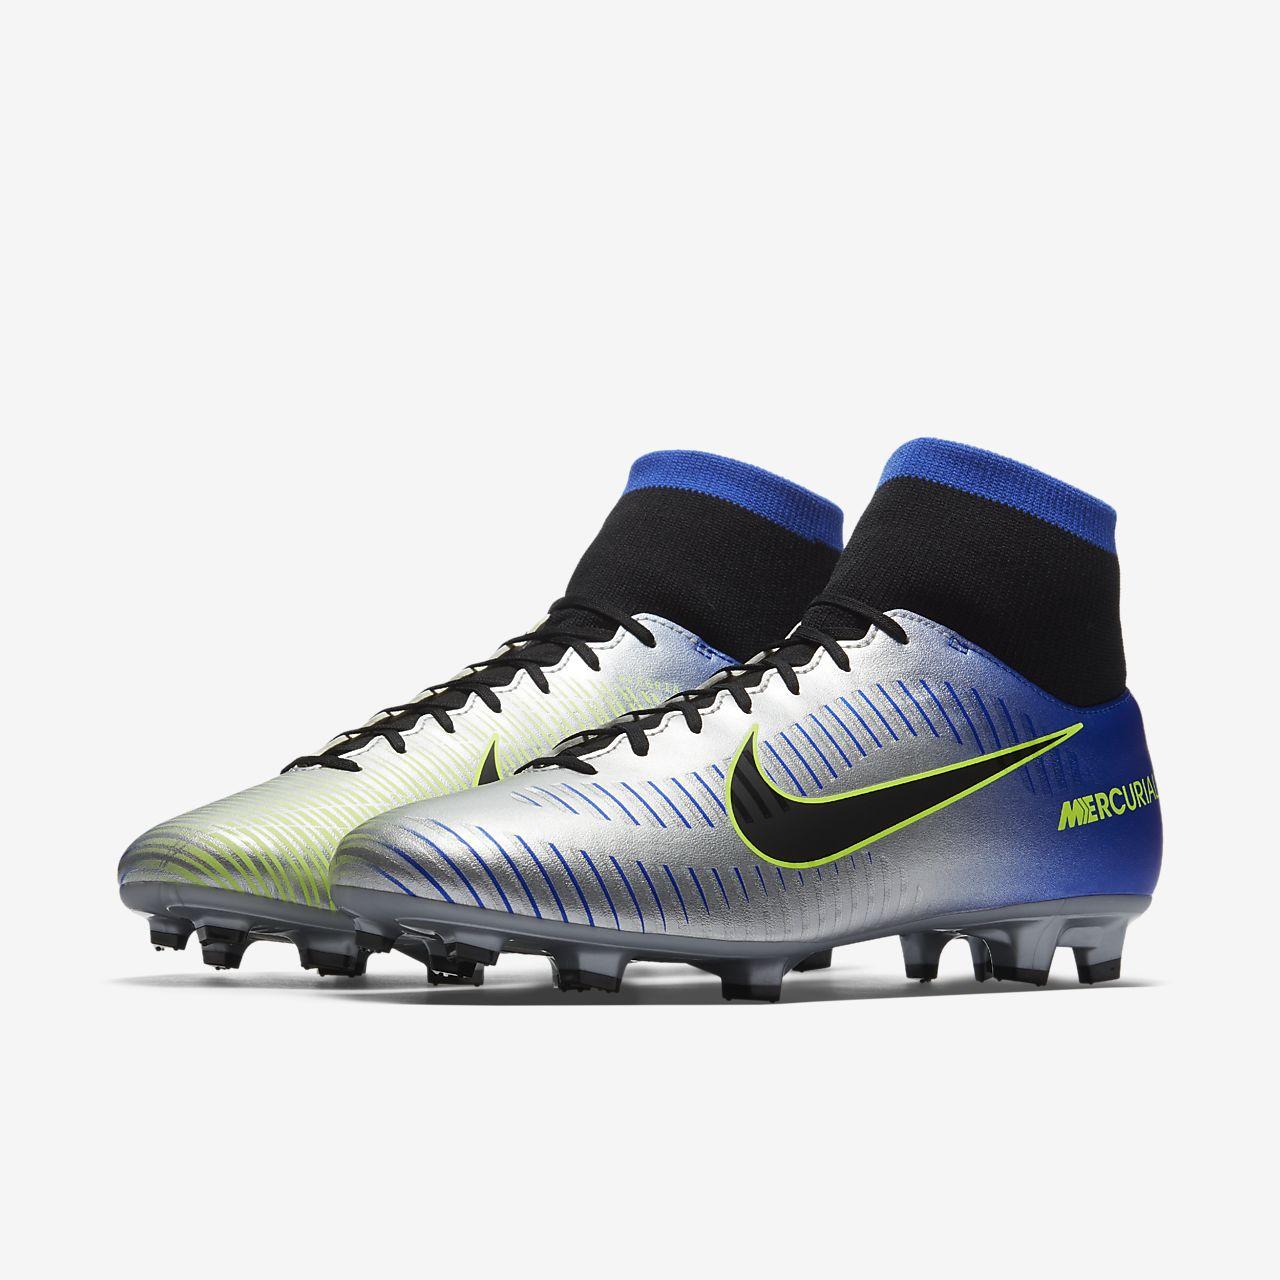 Scarpa da calcio per terreni duri Nike Mercurial Victory VI Dynamic Fit Neymar